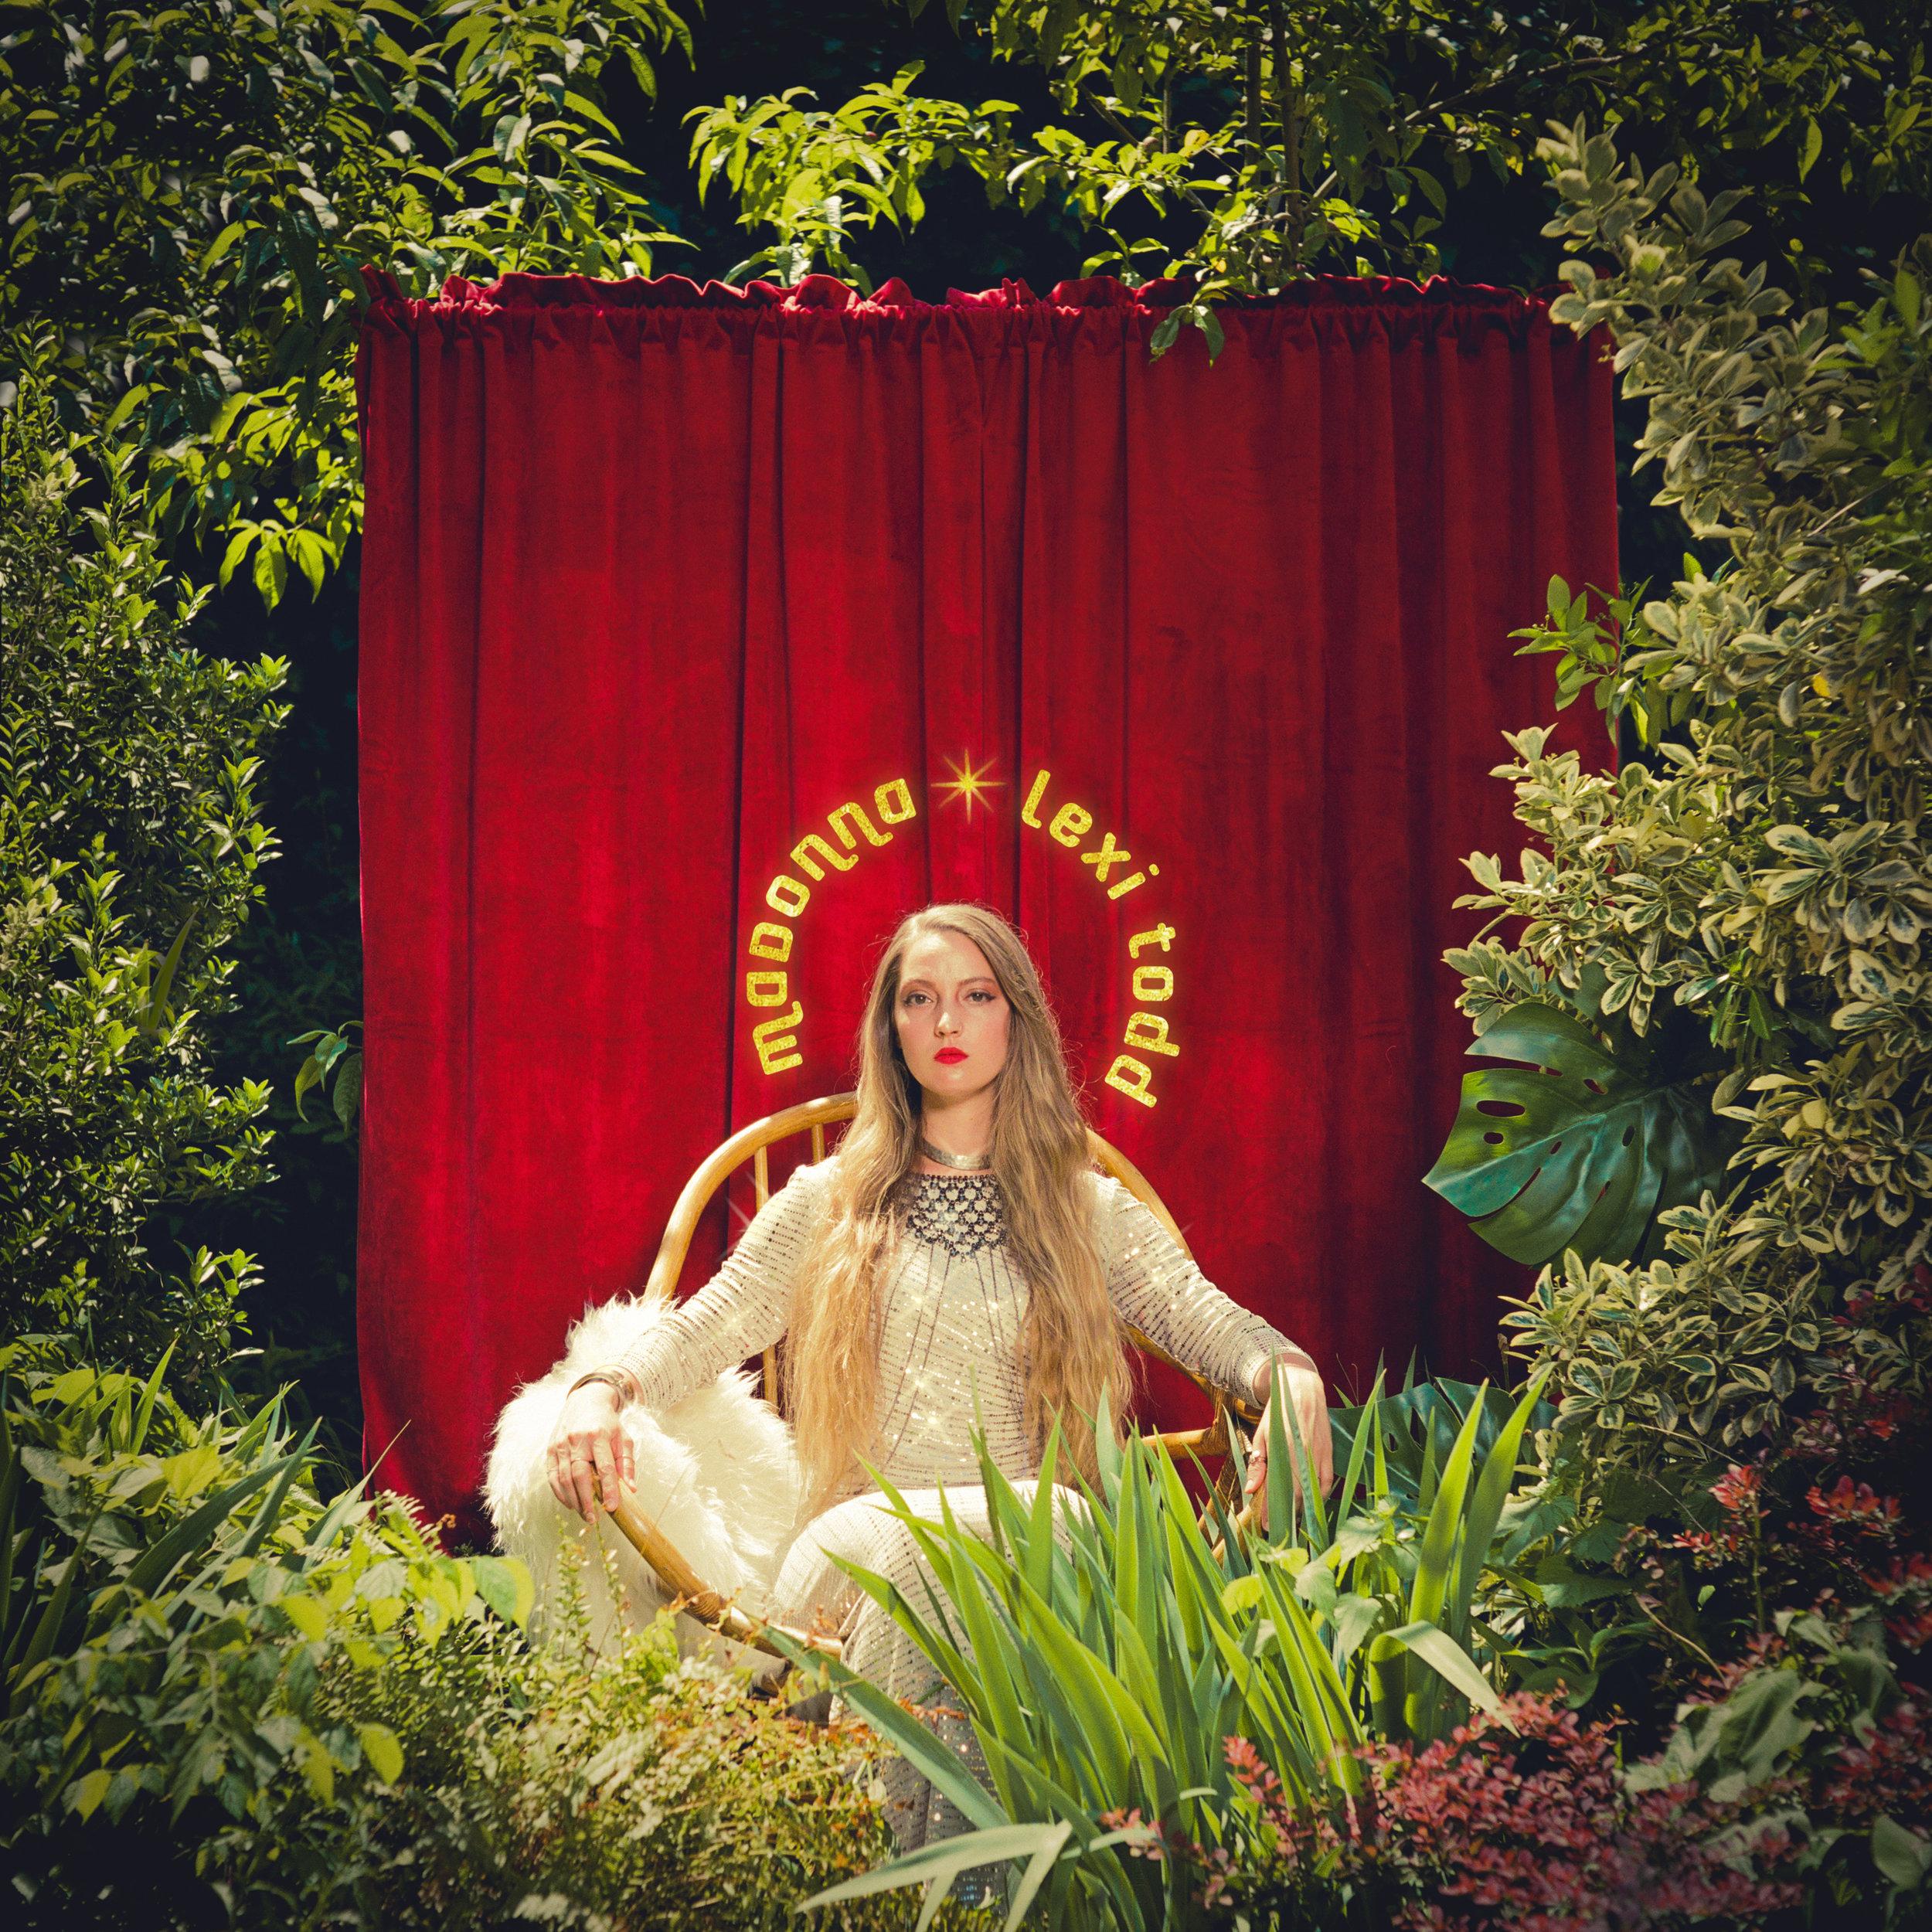 Lexi Todd - Madonna - single artwork